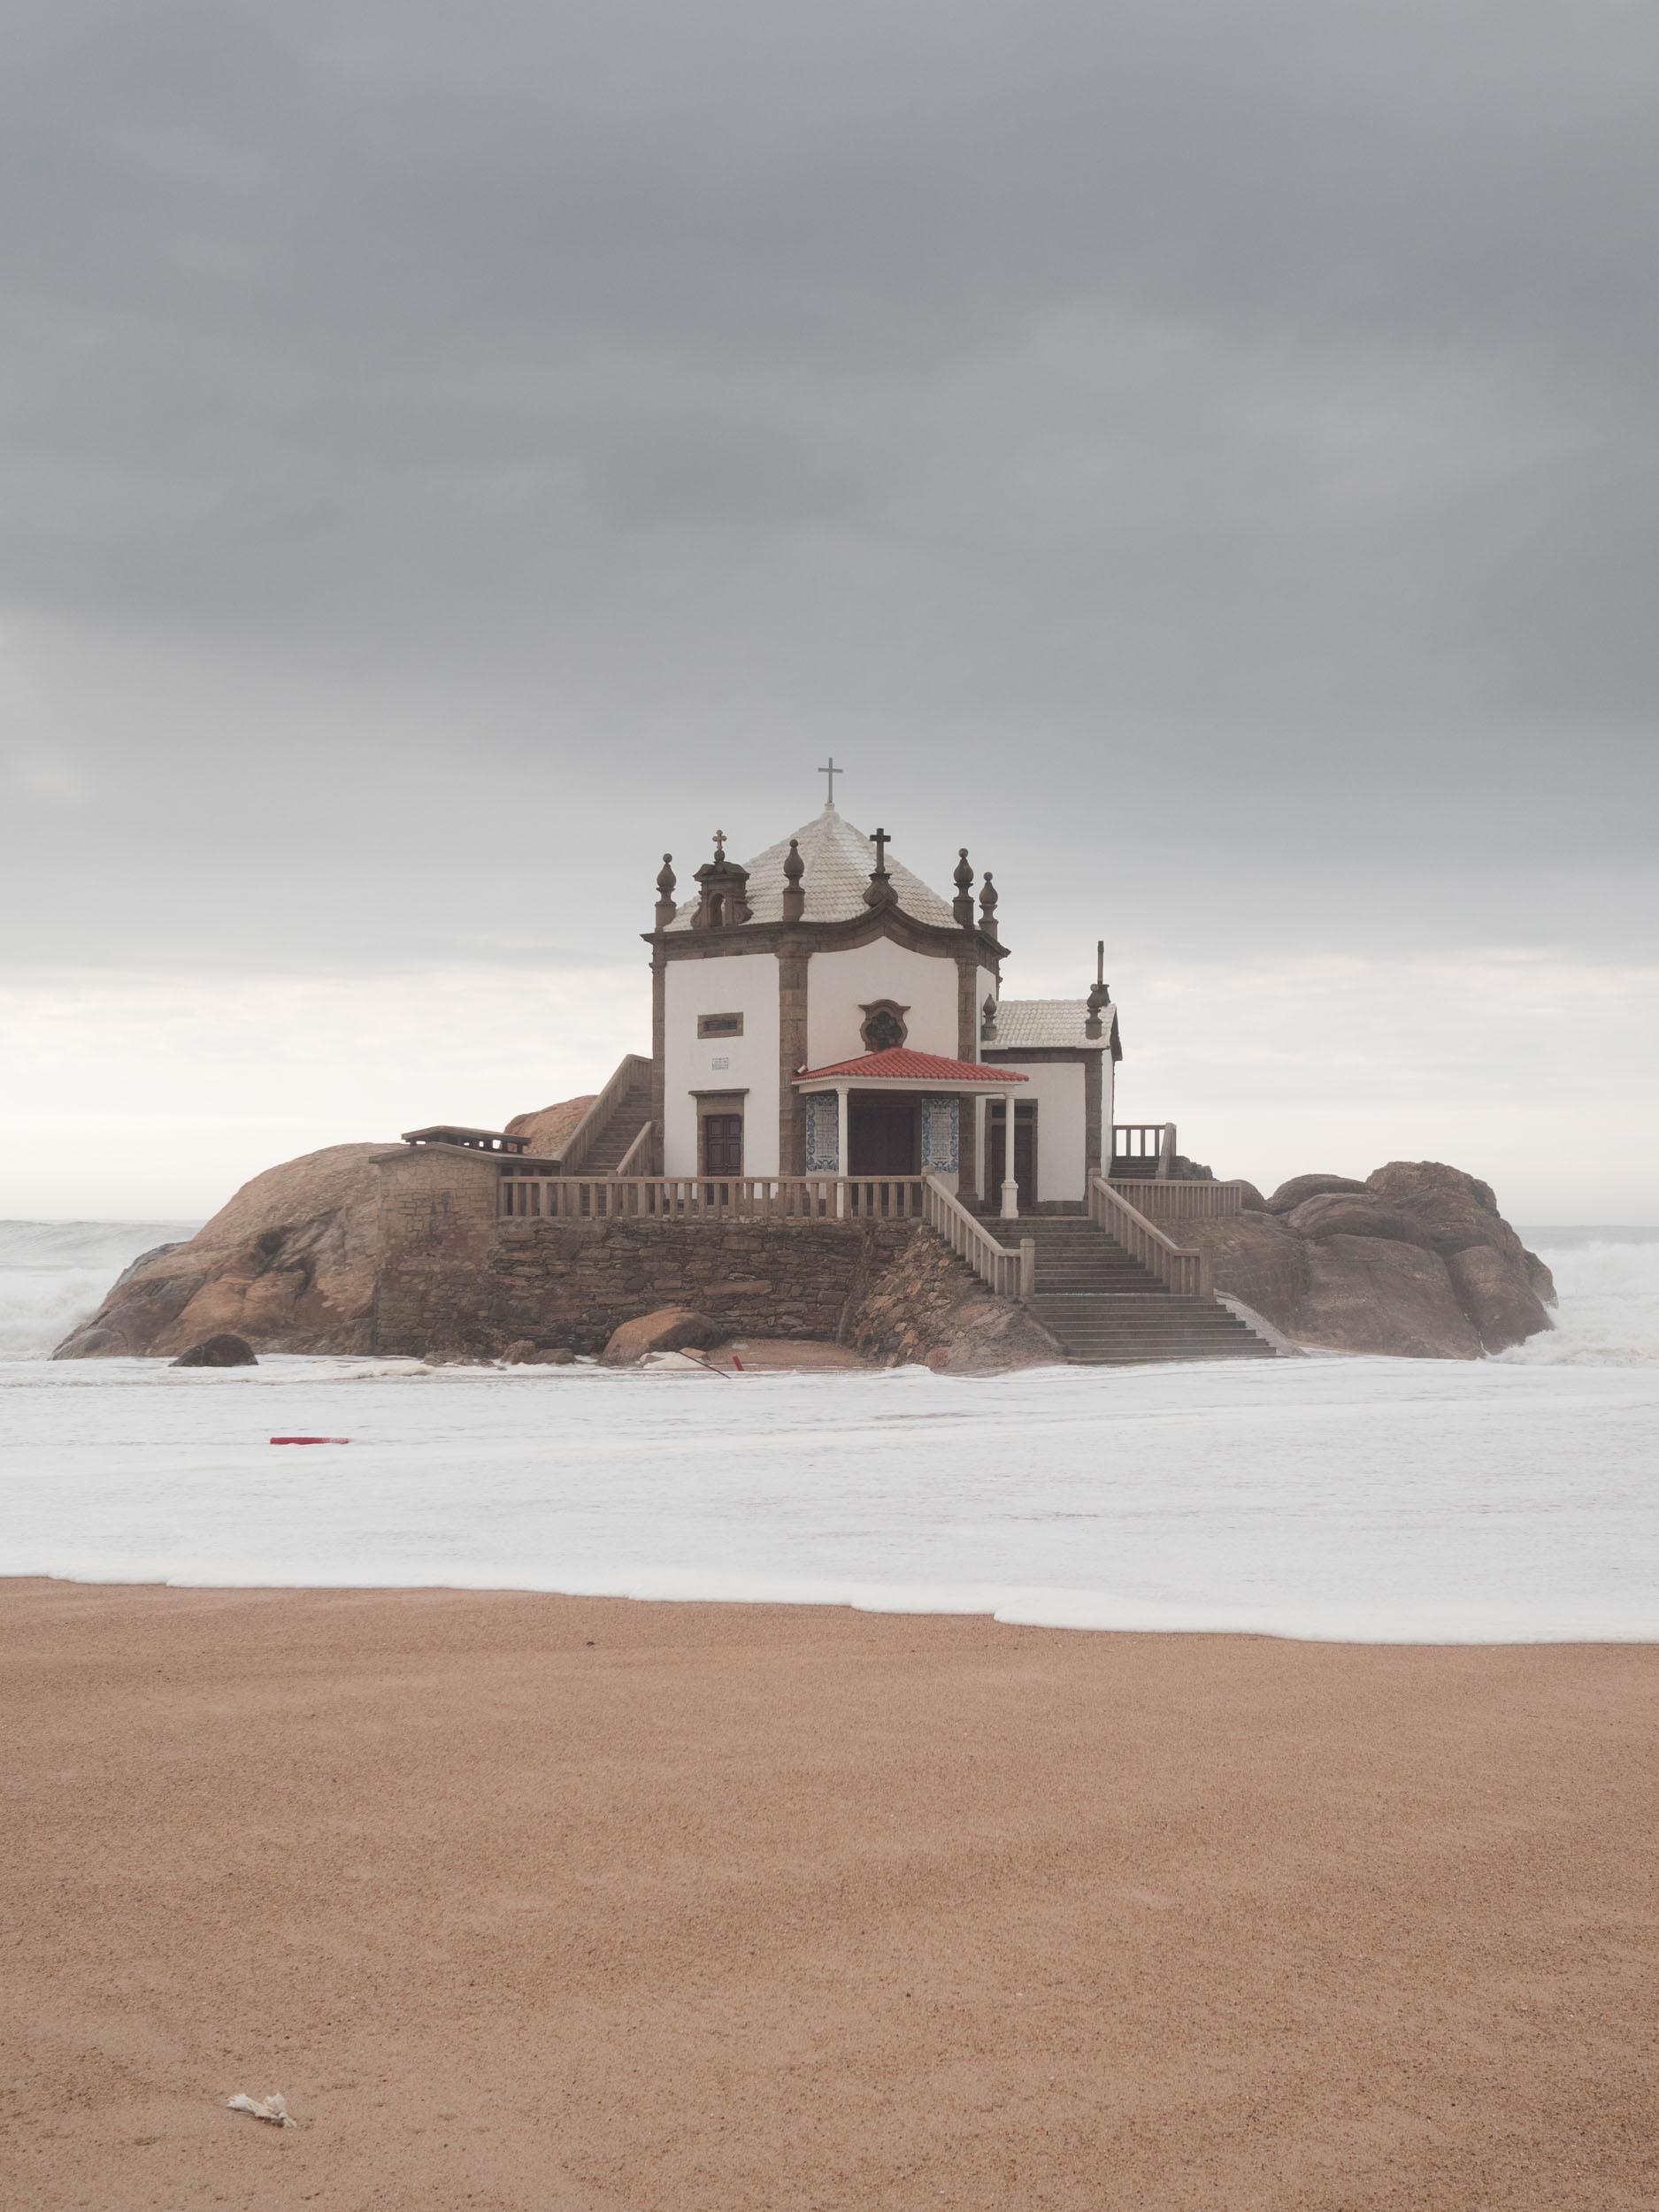 Chapel of Senhor da Pedra in Portugal.